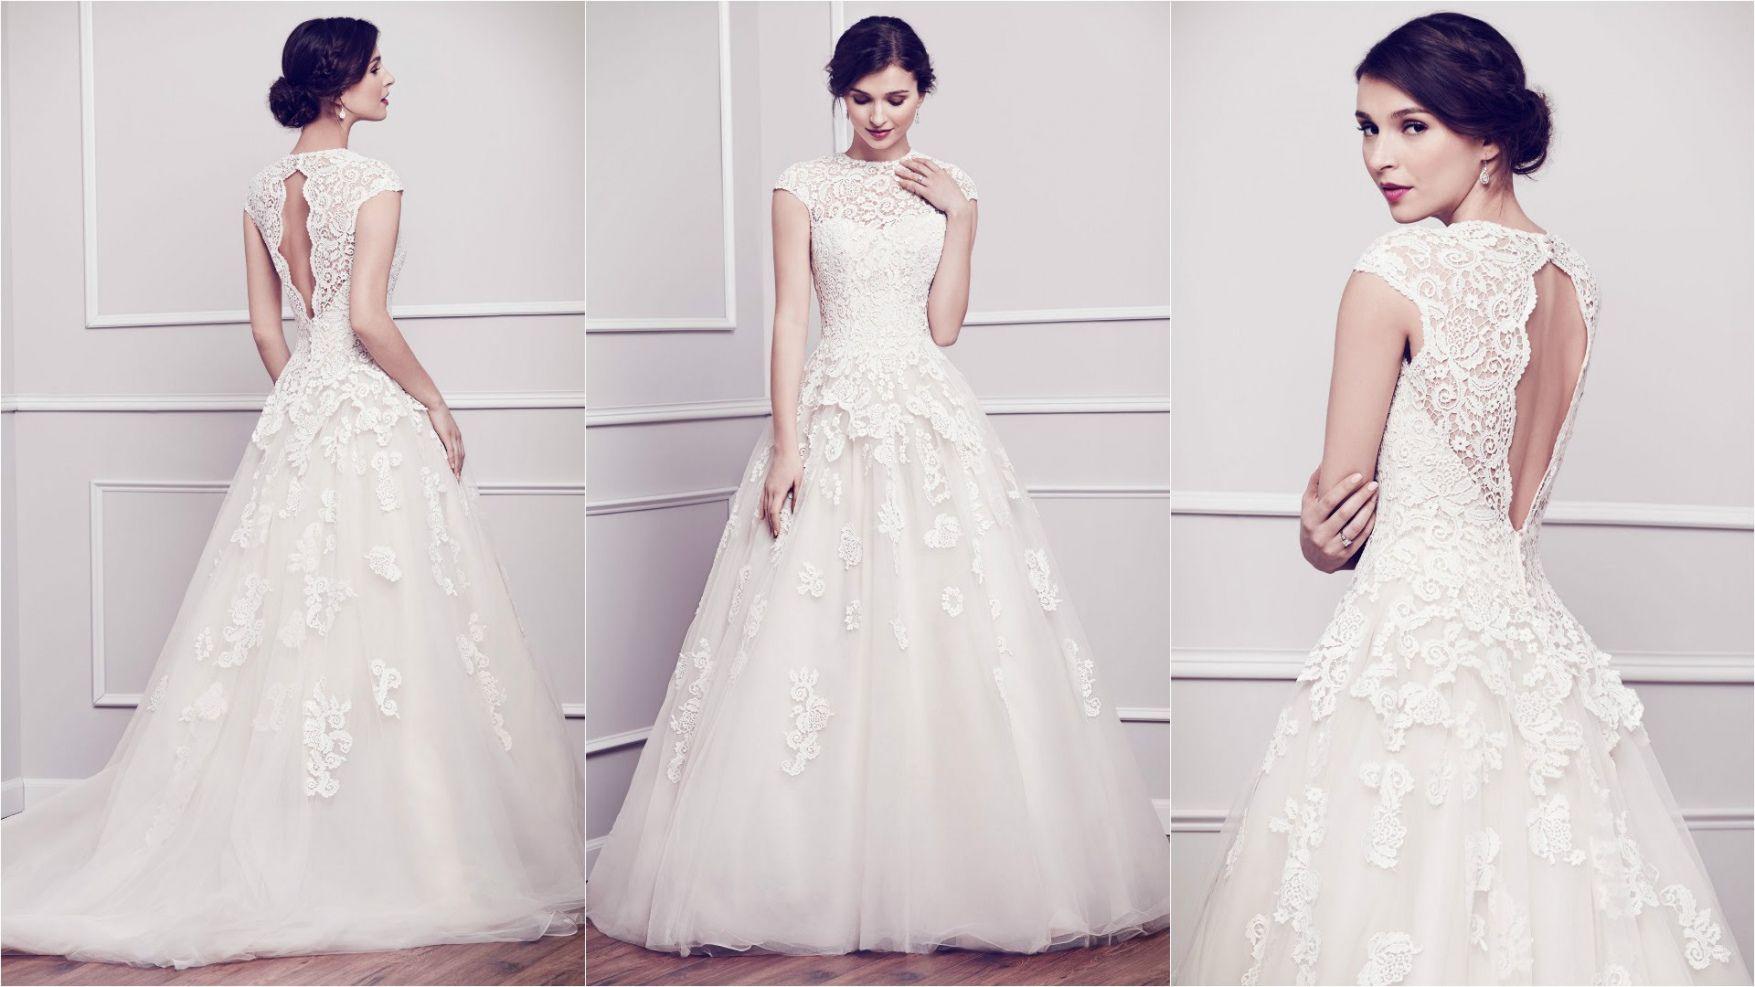 2019 Vera Wang Wedding Dresses for Sale - Cute Dresses for A Wedding ...